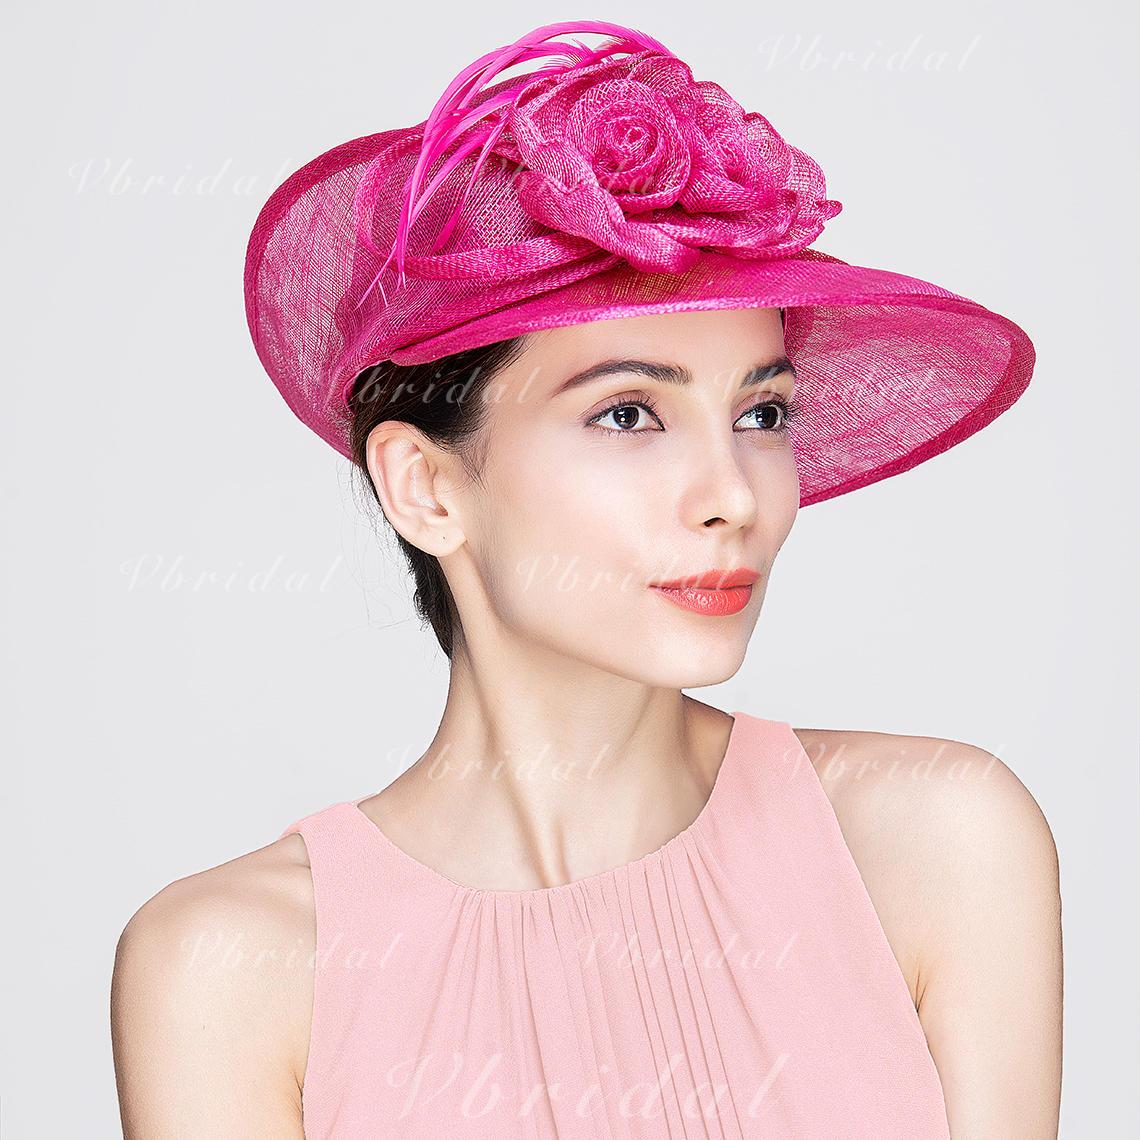 89c73c678b4 Cambric Bowler Cloche Hat Beautiful Ladies  Hats (196193916) - mvbridal